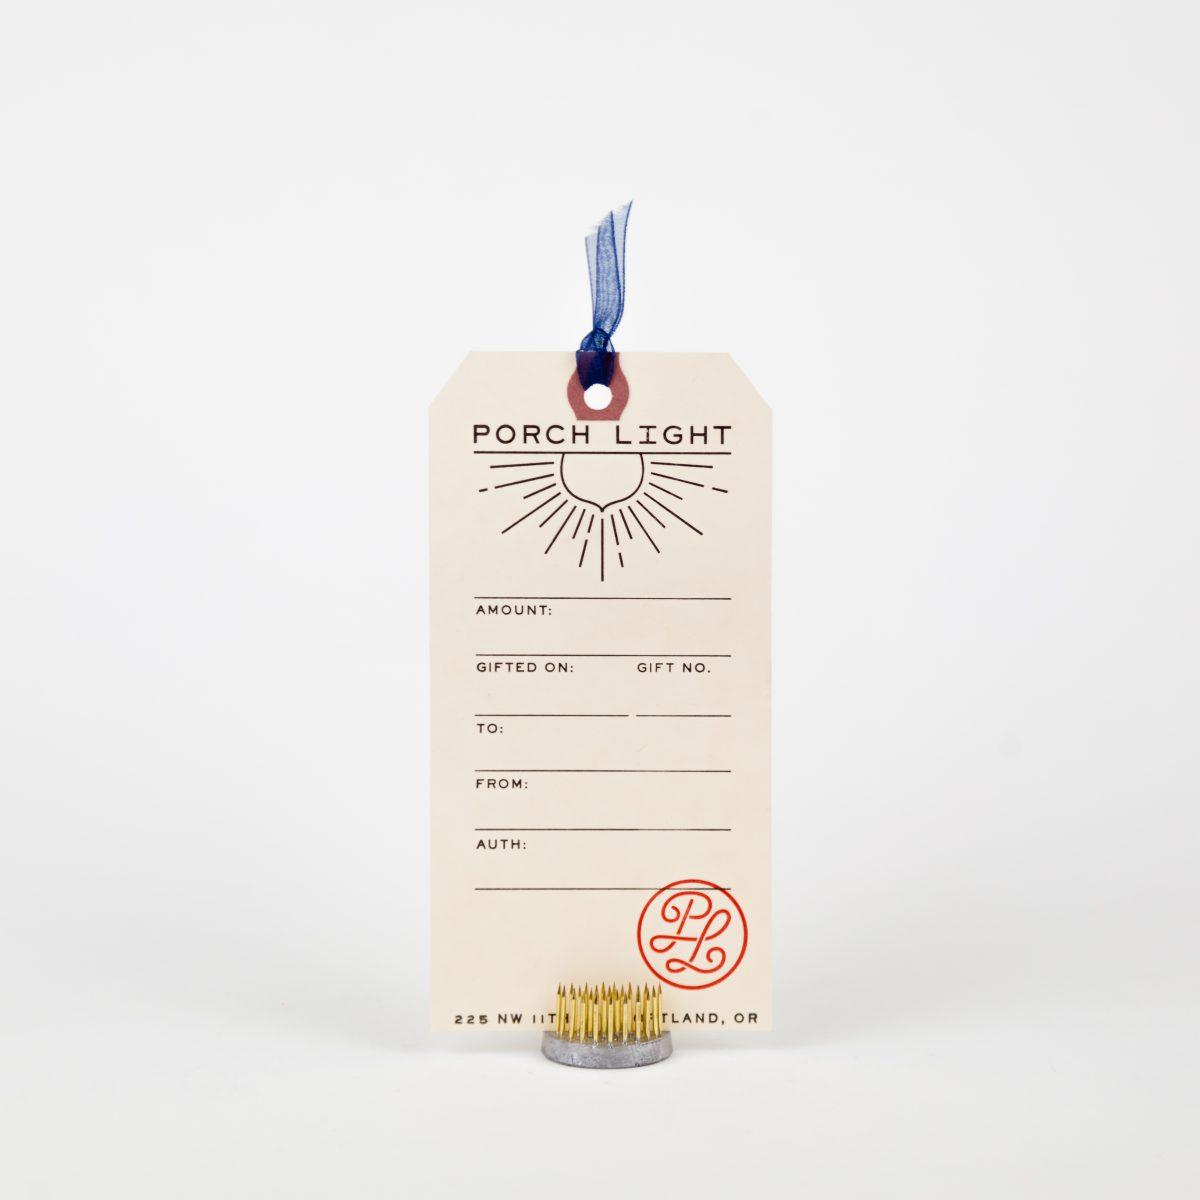 porch-light-gift-certificate